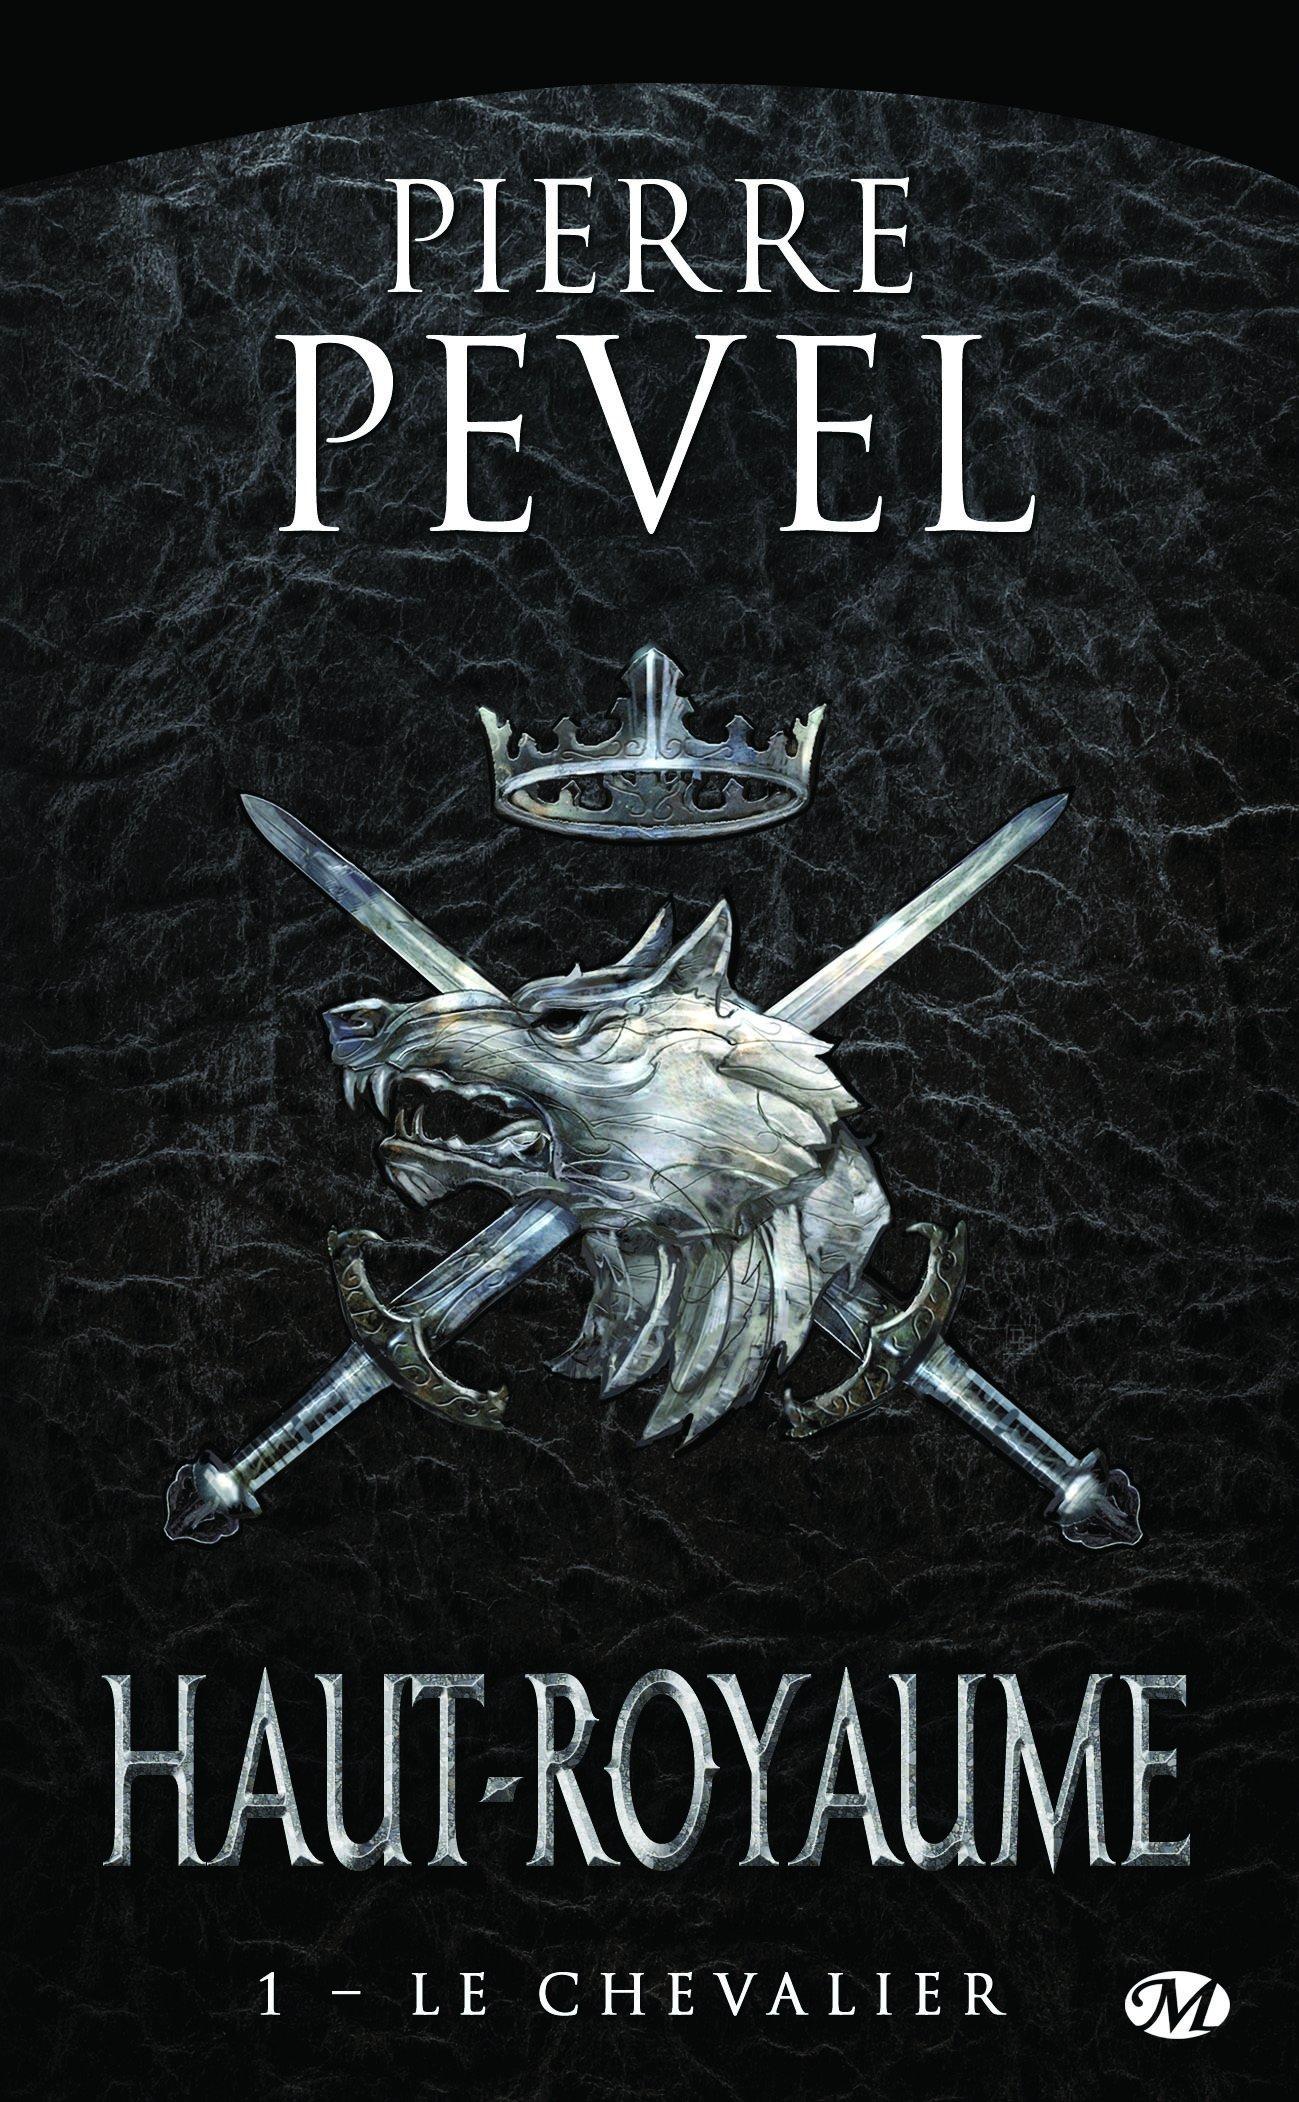 Haut-Royaume, Tome 1 : le Chevalier 91tRyl8jsQL